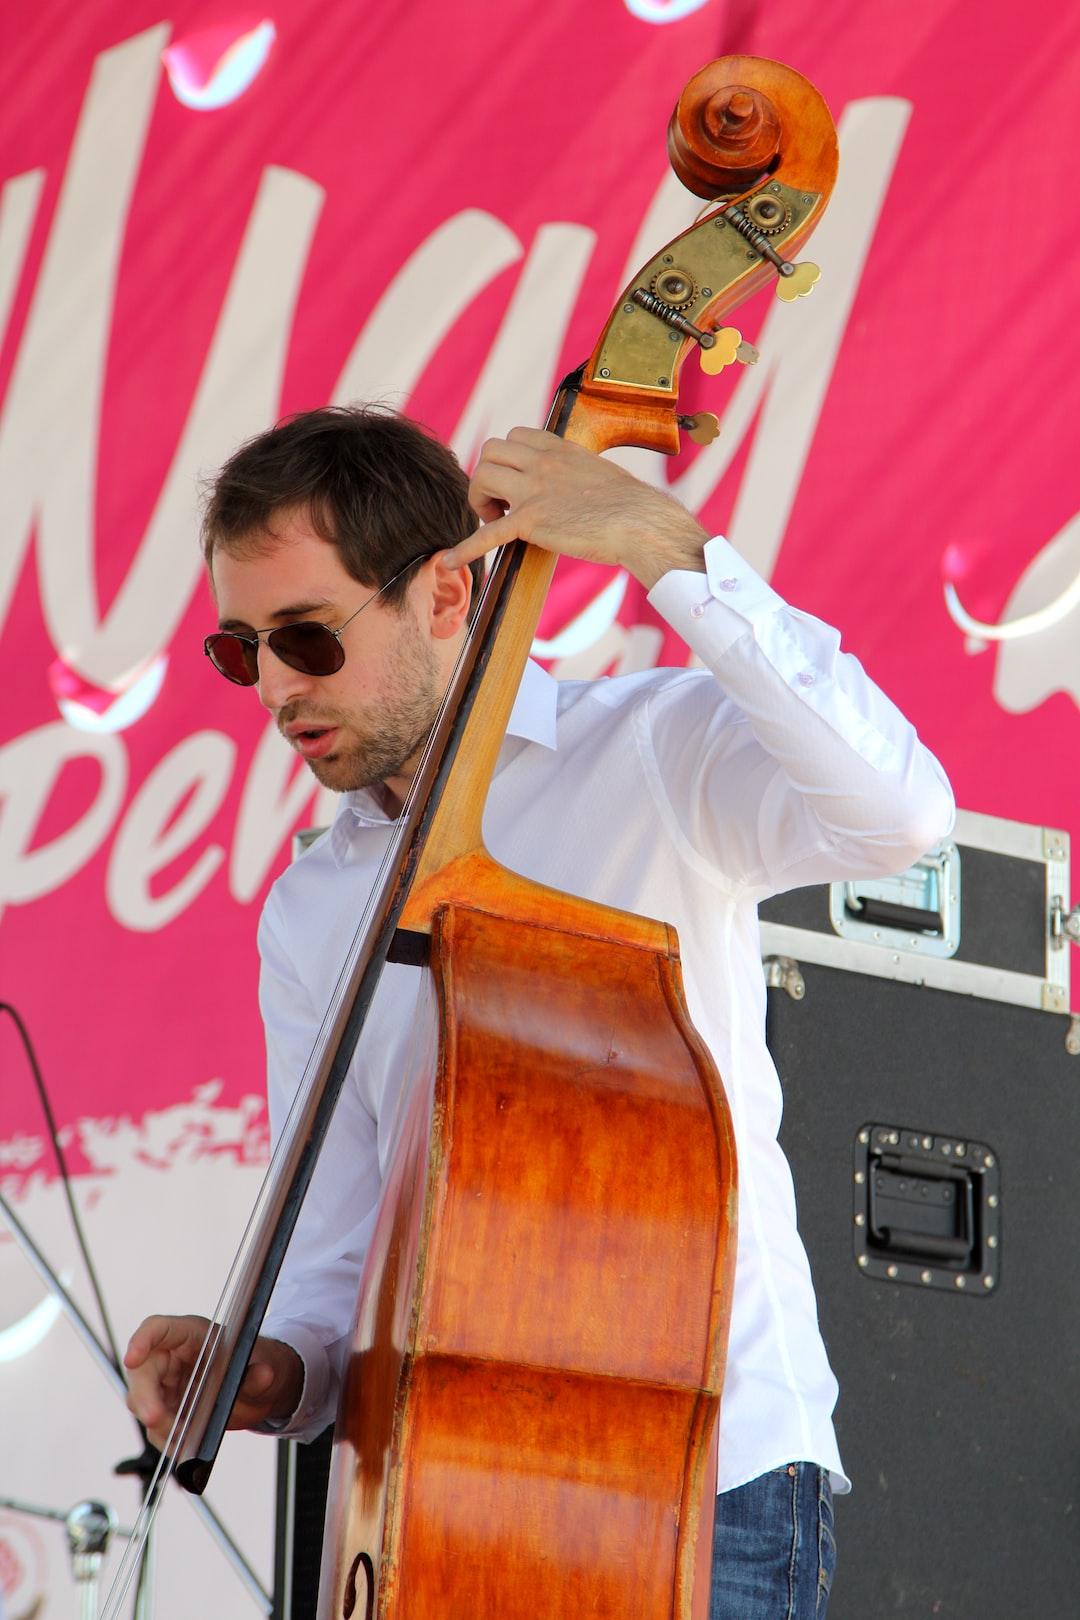 Photo taken at the jazz festival Jazz May Penza 2014